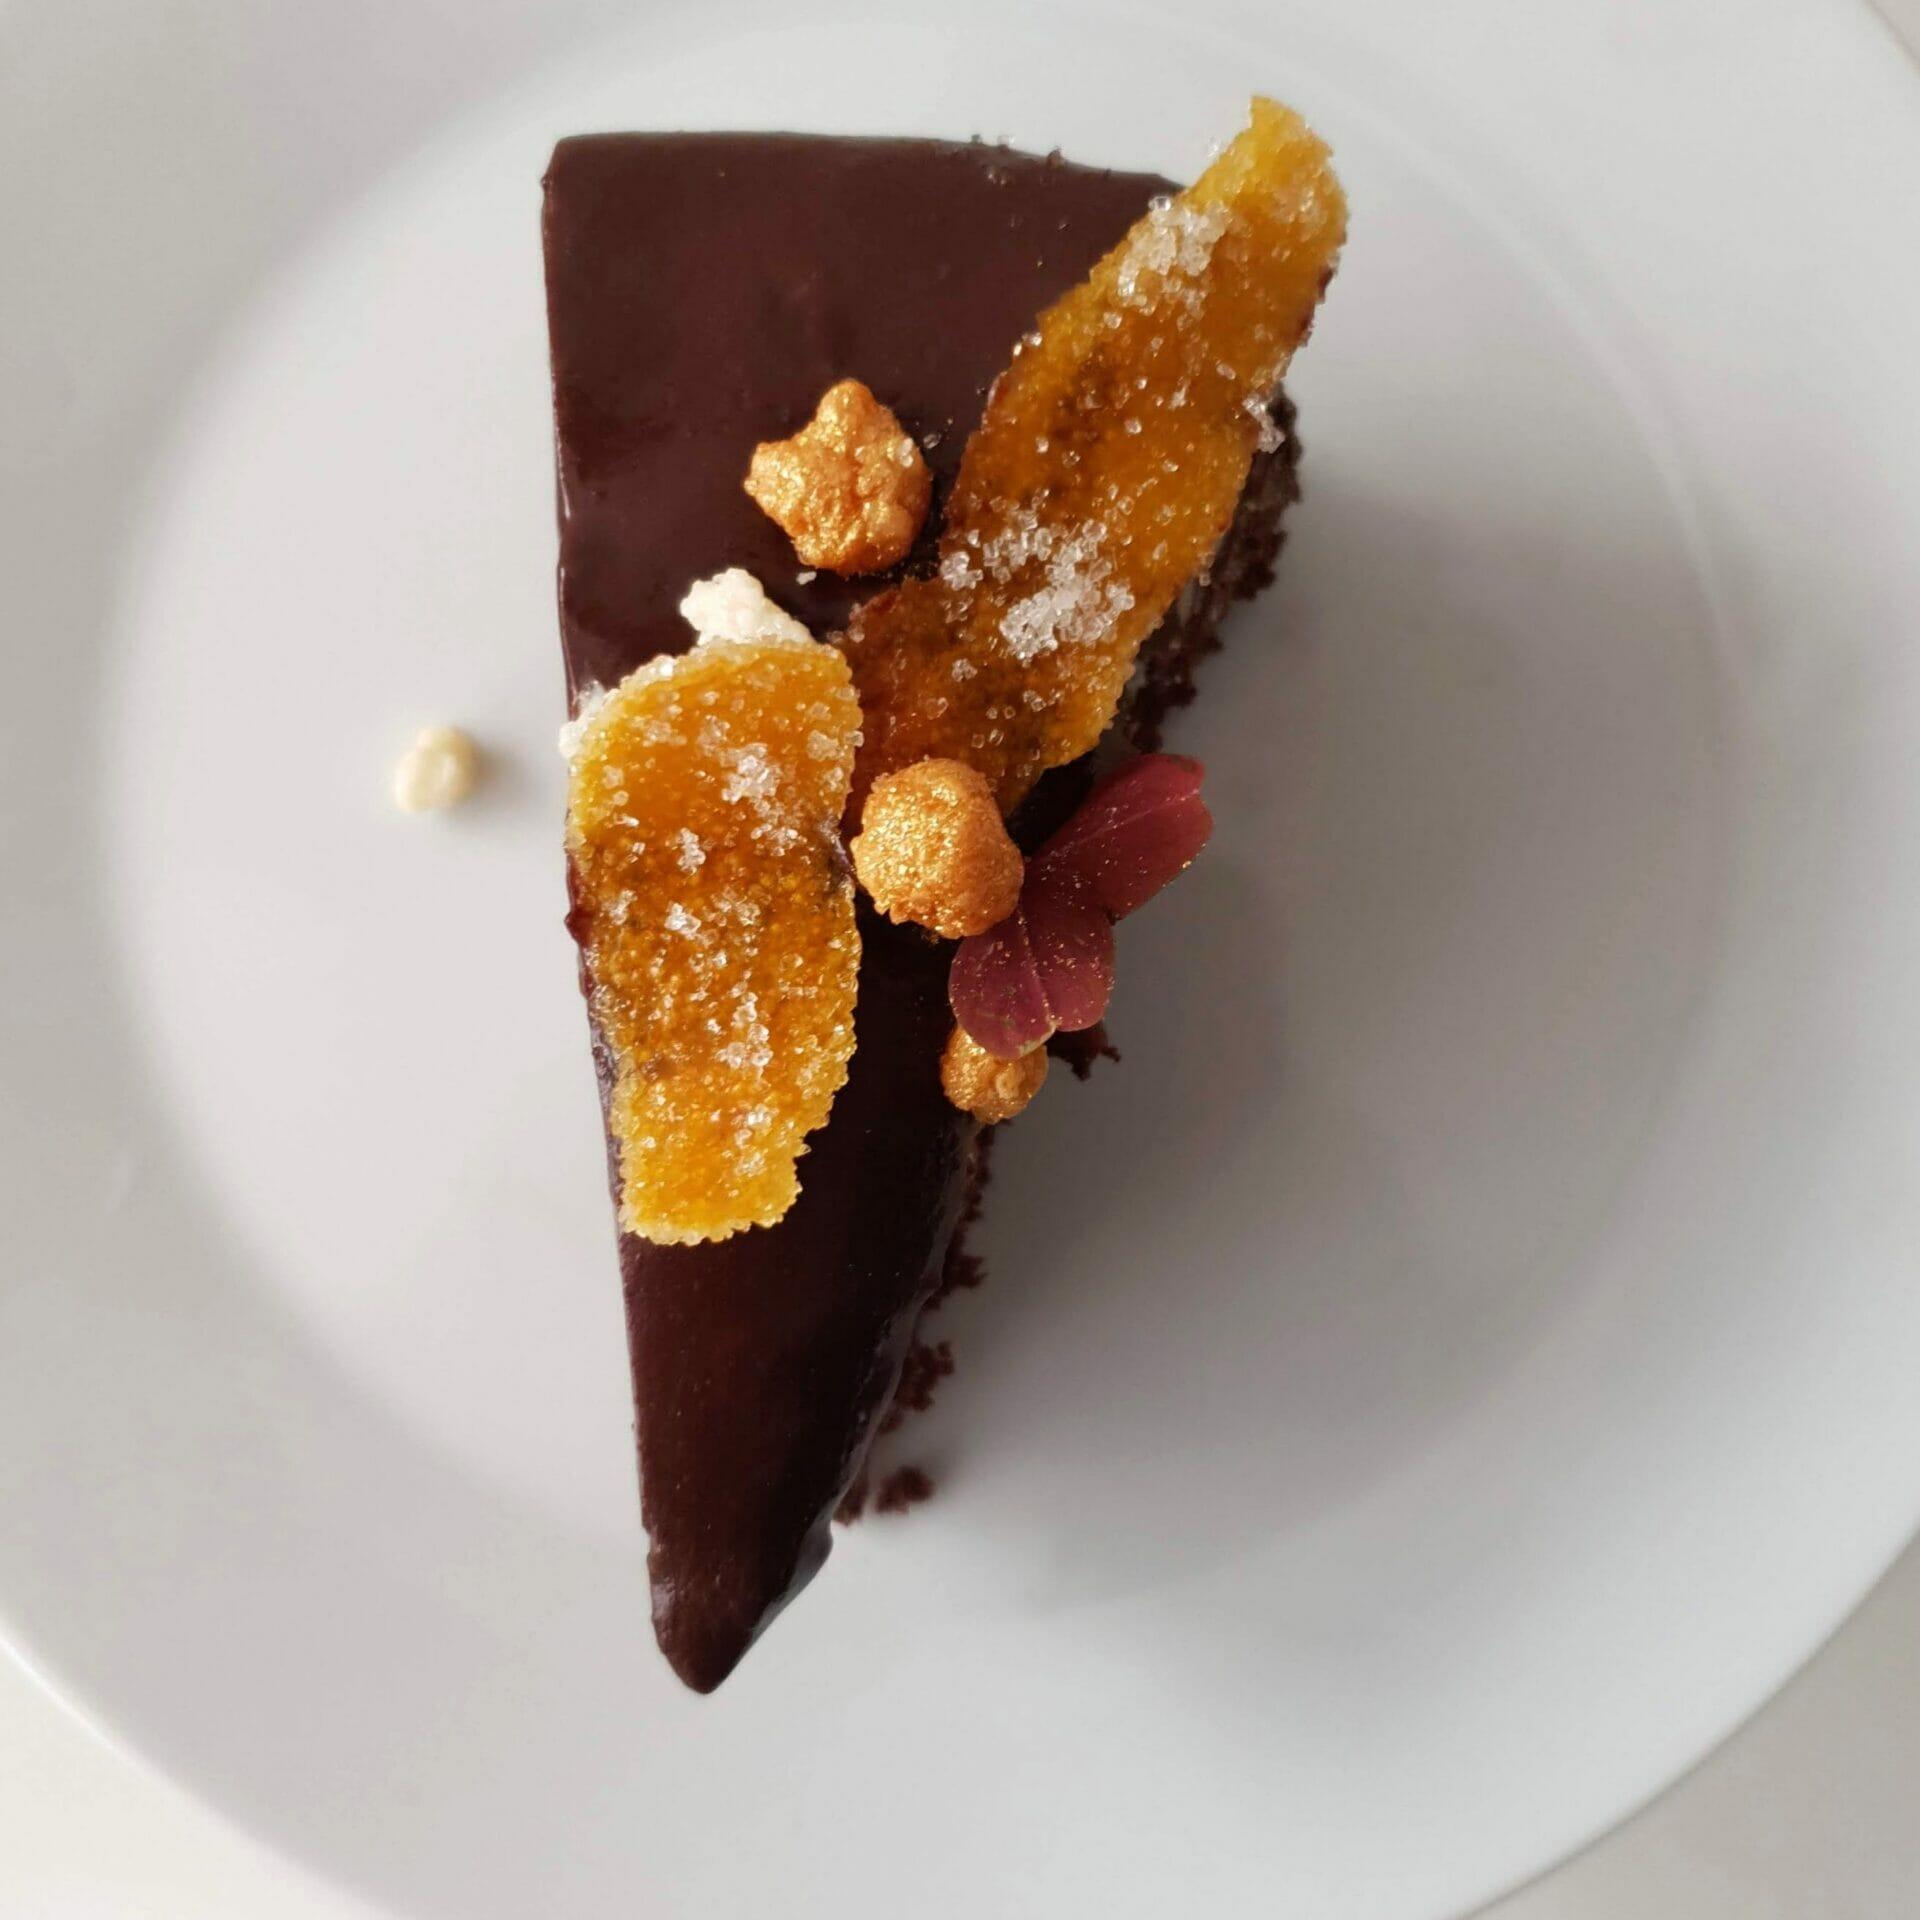 Chokoladelagkage med praliné knas, mokkamousse og appelsinchokoladeglasur. En lækker luksus moussekage til fødselsdag og fest. Prøv denne lagkage, hvis du er til chokolade, appelsin og kaffe. Find opskrifter, gratis print og inspiration til årets gang på danishthings.com #DanishThings #chokoladelagkage #chokoladelagkage-med-appelsin-og-kaffe #mousse #appelsinchokoladeglasur #mokkamousse #chokolademousse-med-kaffe #praliné-med-knas #chokoladelagkagebunde-med-appelsin #chokolade #praliné #appelsin #kaffe #chokolademousse #chokoladelagkagebunde #fødselsdag